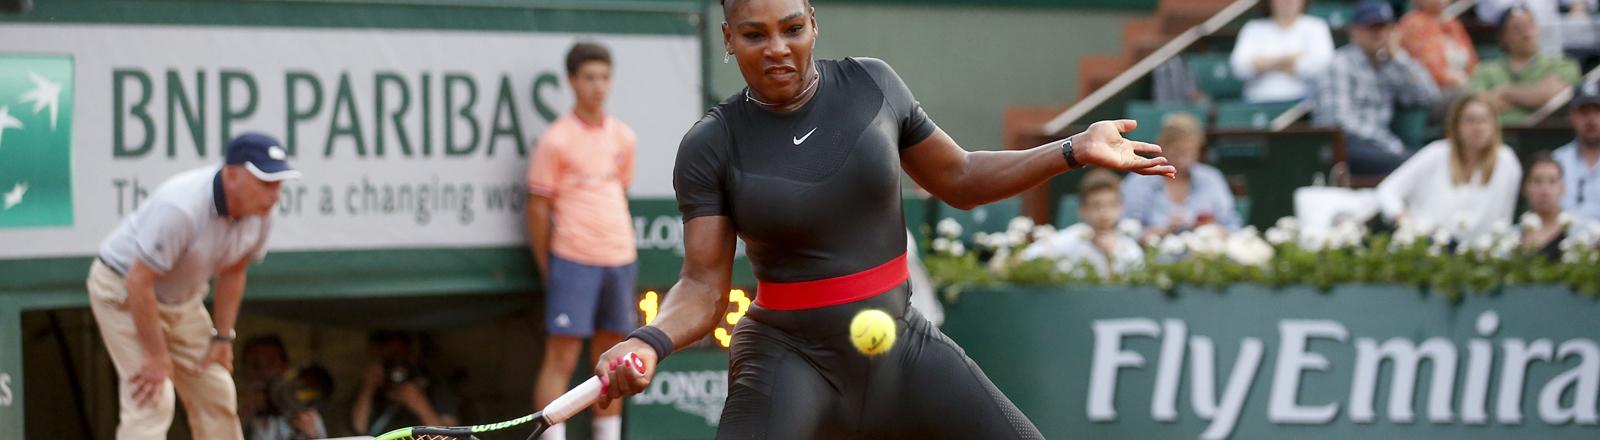 Serena Williams im Catsuit bei den French Open 2018